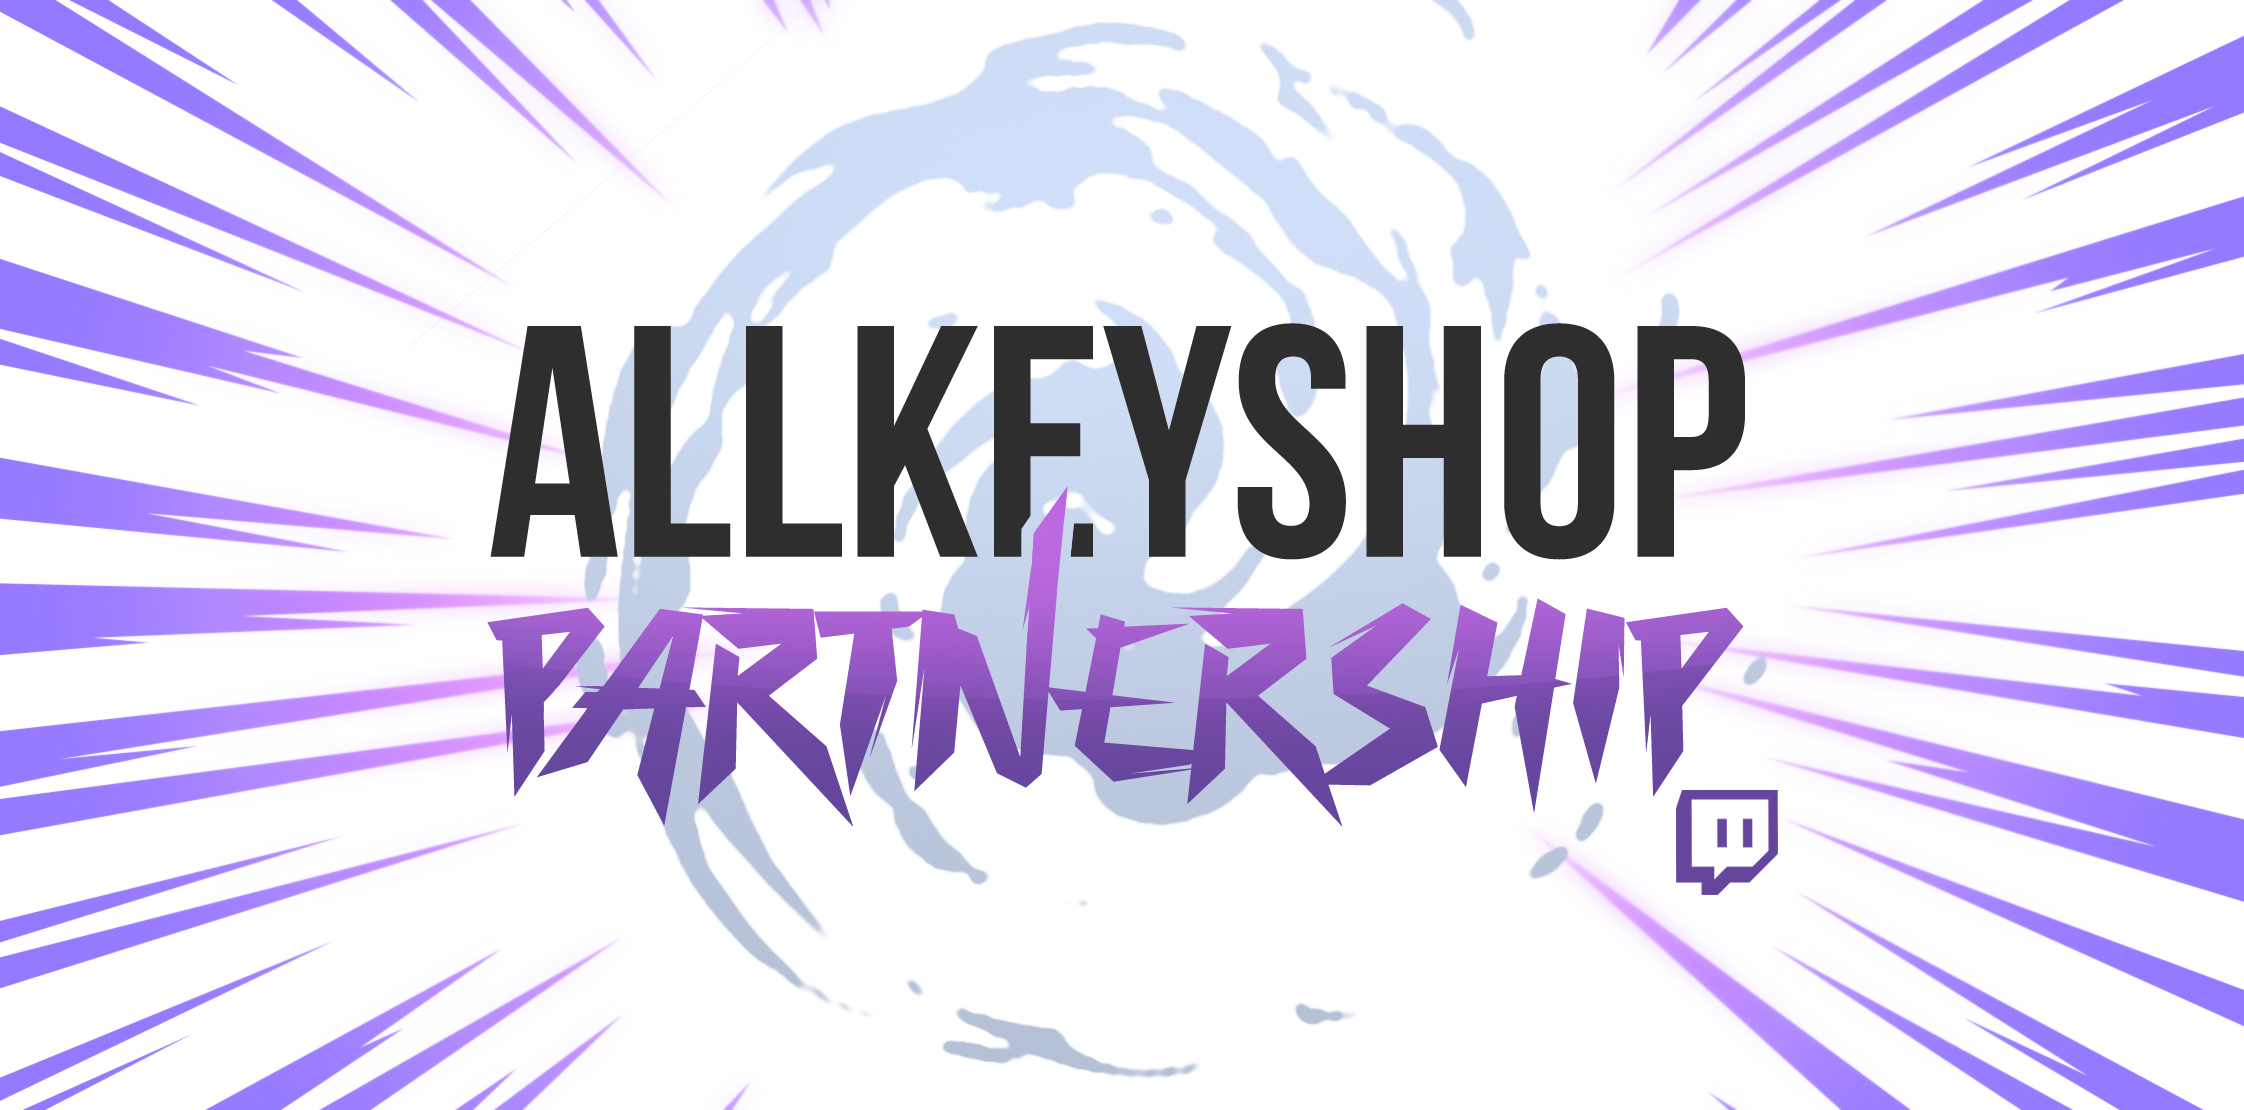 Allkeyshop Partnership